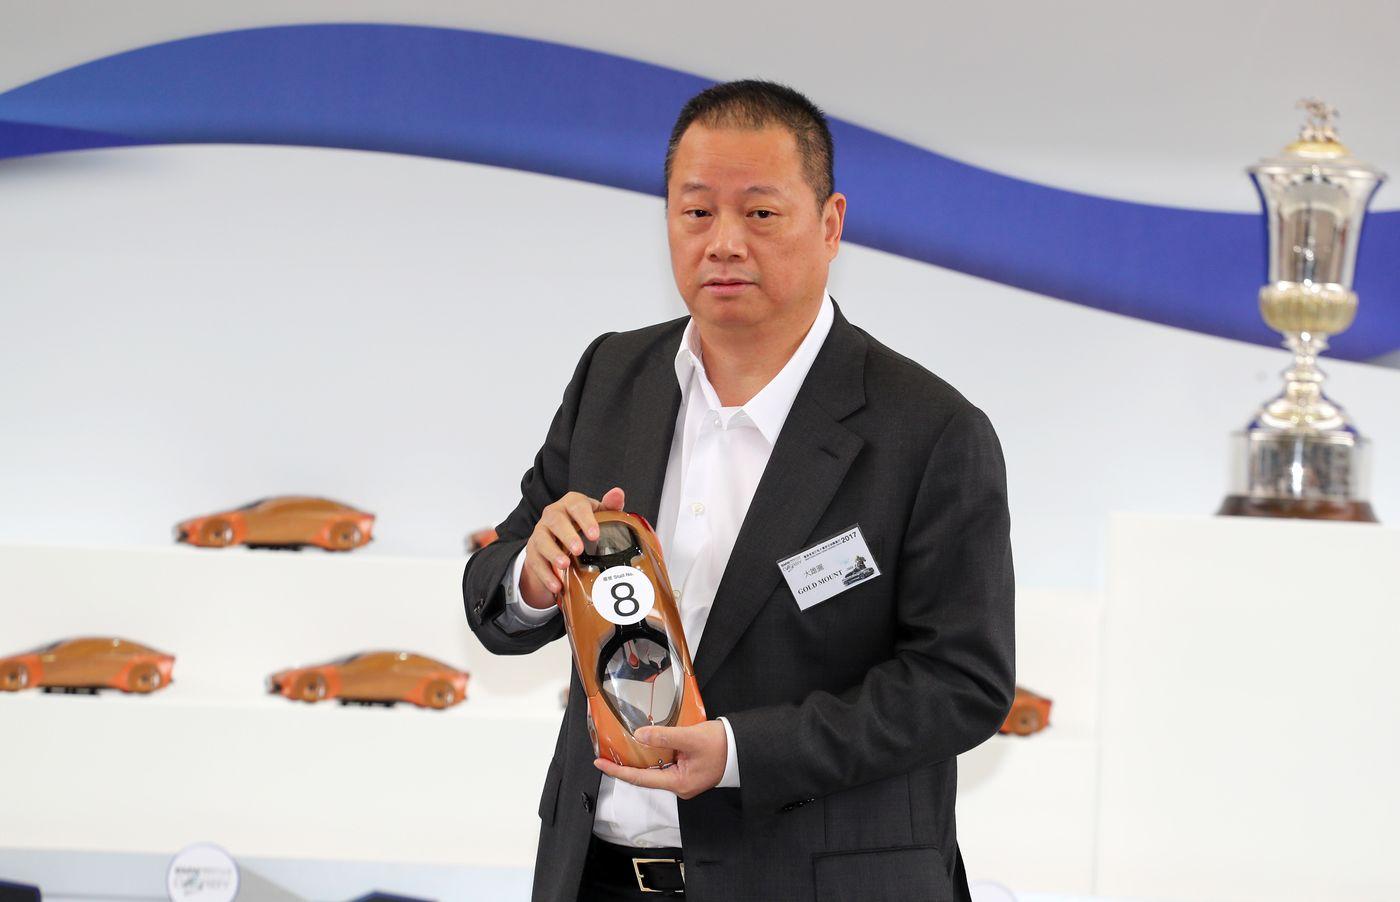 https://anysizedealsweek.com/wp-content/uploads/2021/01/Pan-Sutong-Richest-man-in-Asia.jpg